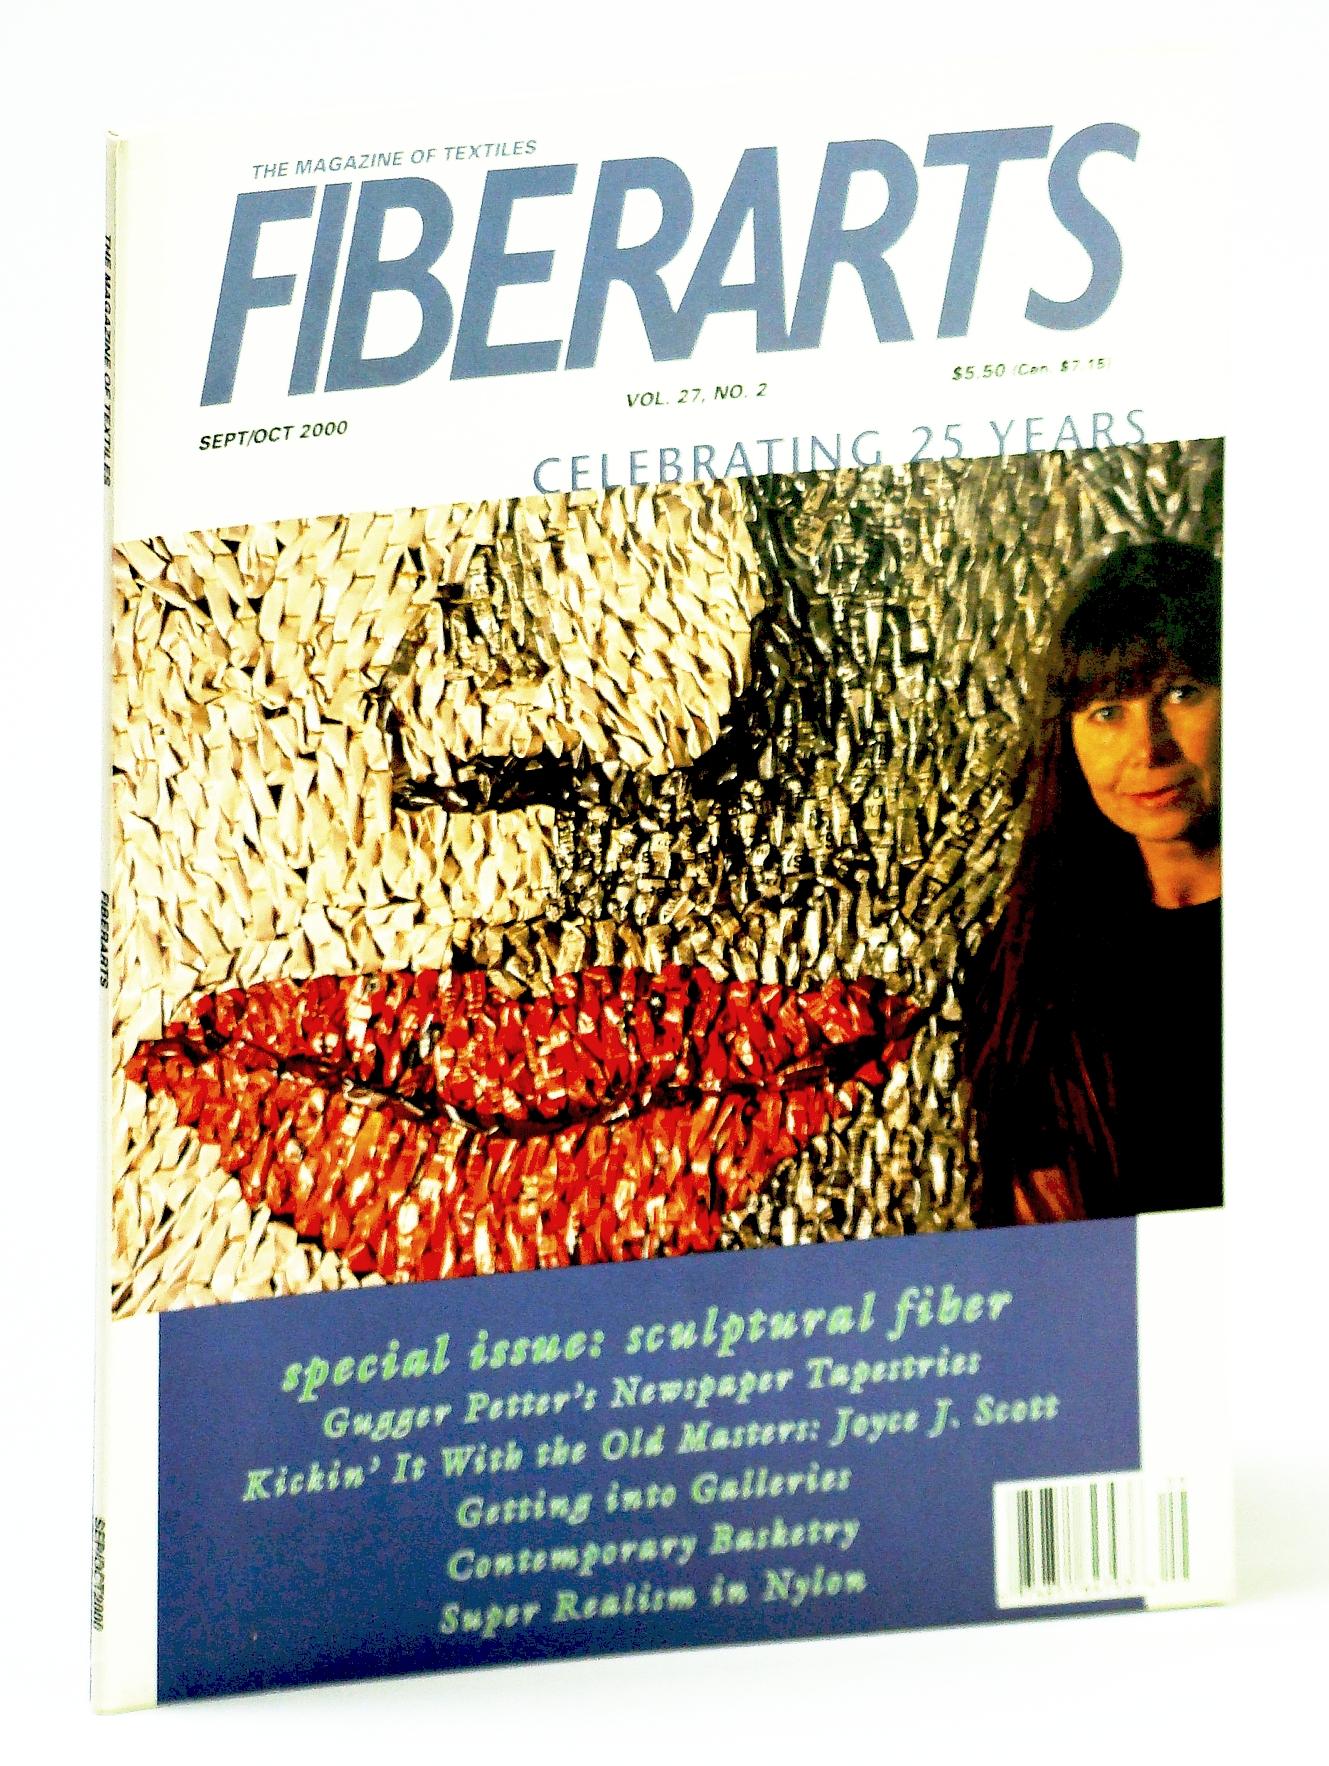 Image for Fiberarts, The Magazine of Textiles,  September / October (Sept./ Oct.) 2000: Sculptured Fiber